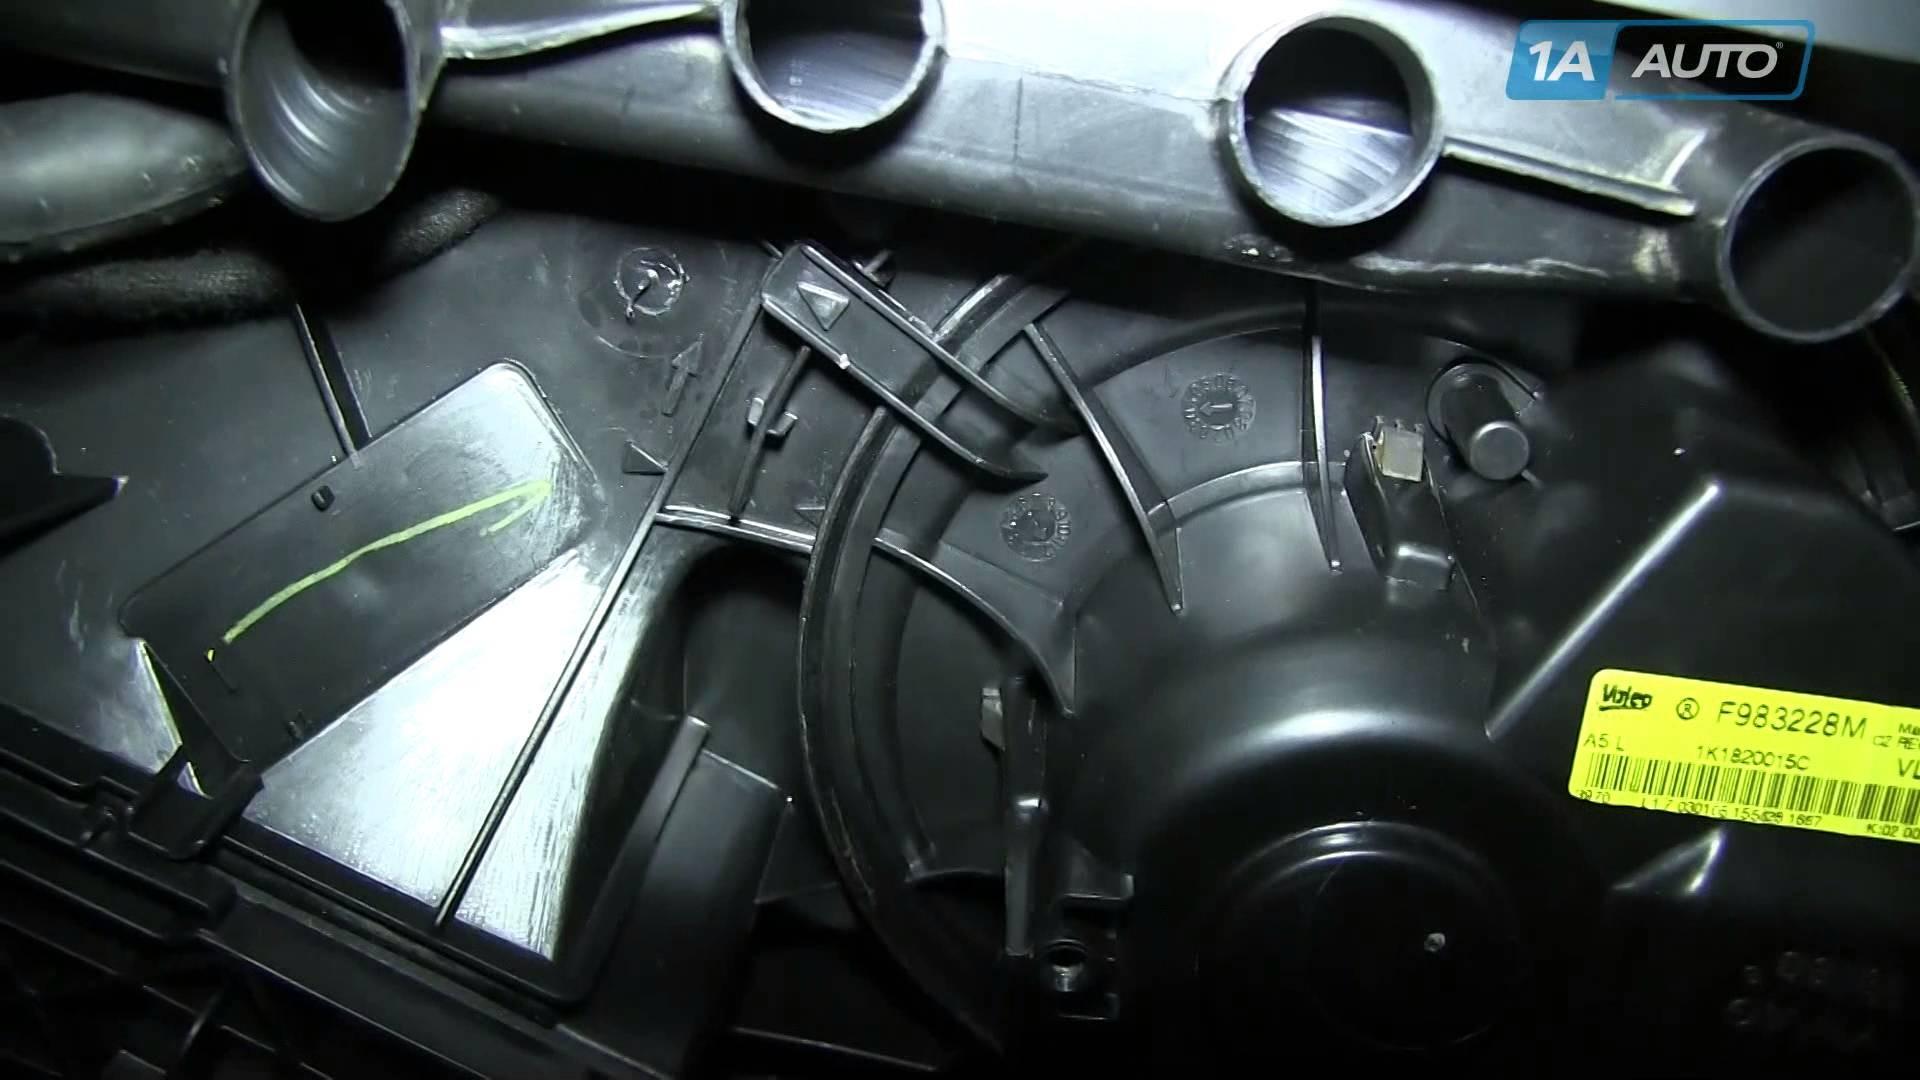 Diagram As Well 2011 Vw Jetta Fuse Box Diagram On Sel Engine Diagram